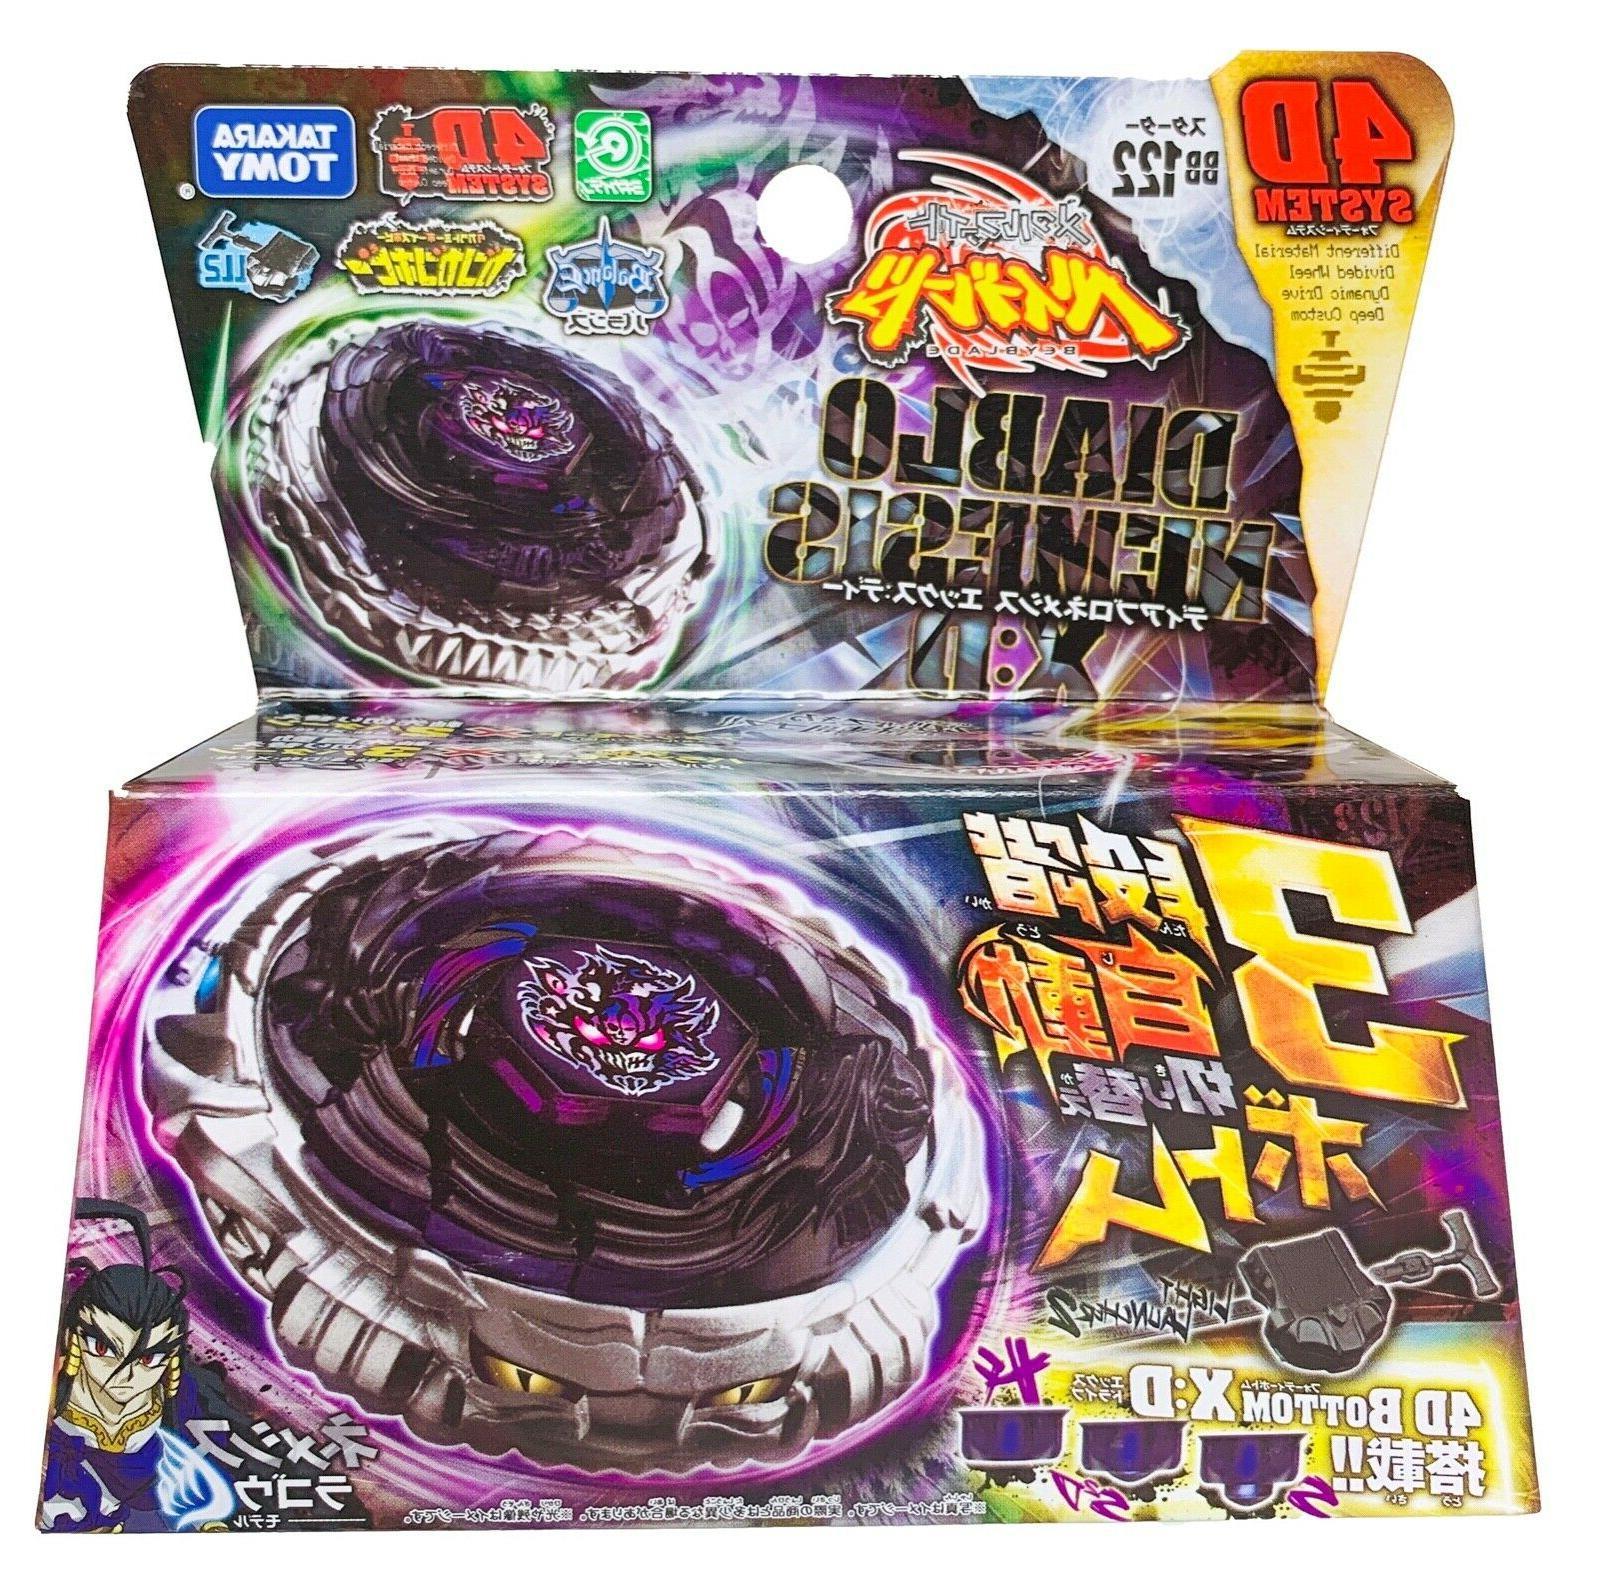 TAKARA TOMY / HASBRO Diablo Nemesis X:D Metal Fury Beyblade